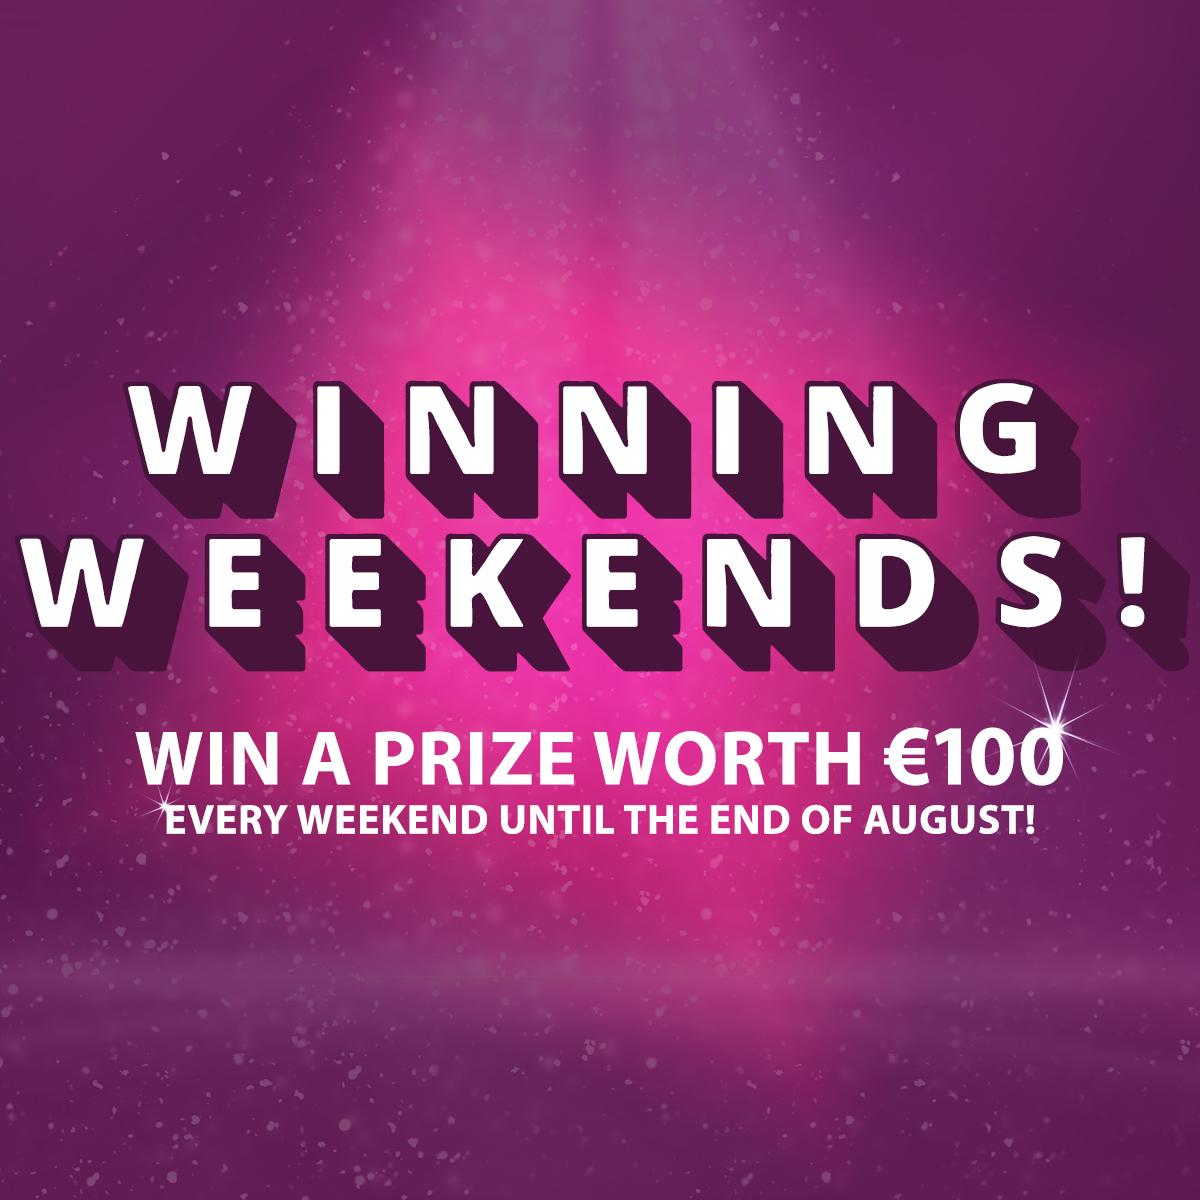 Winning Weekends at CityEast Retail Park!